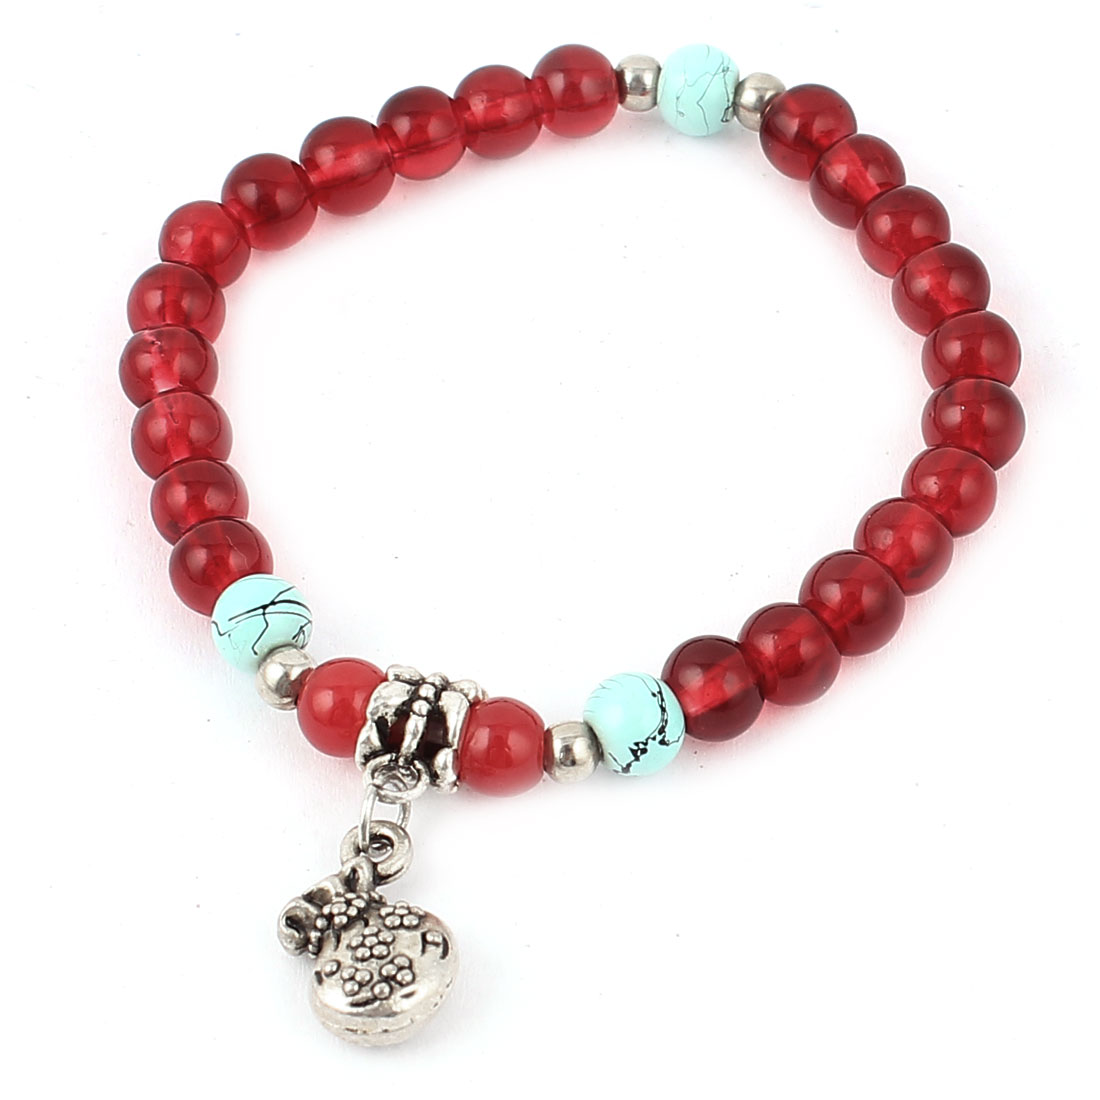 Women Wallet Pendant Decor Plastic Crystal Beads Linked Bracelet Carmine